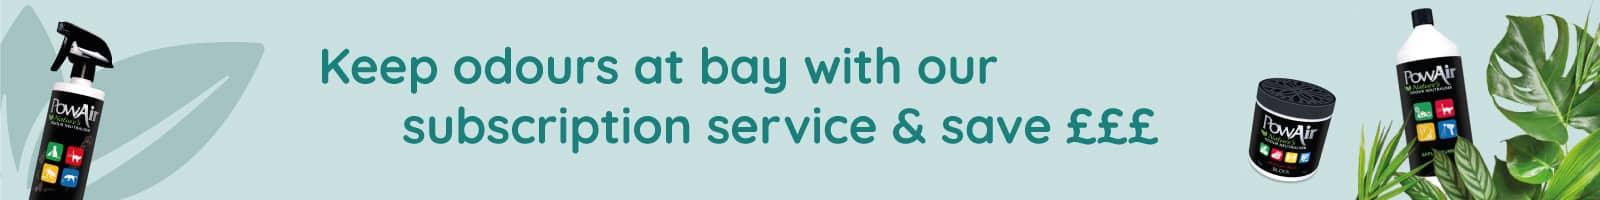 PowAir Subscription save money banner